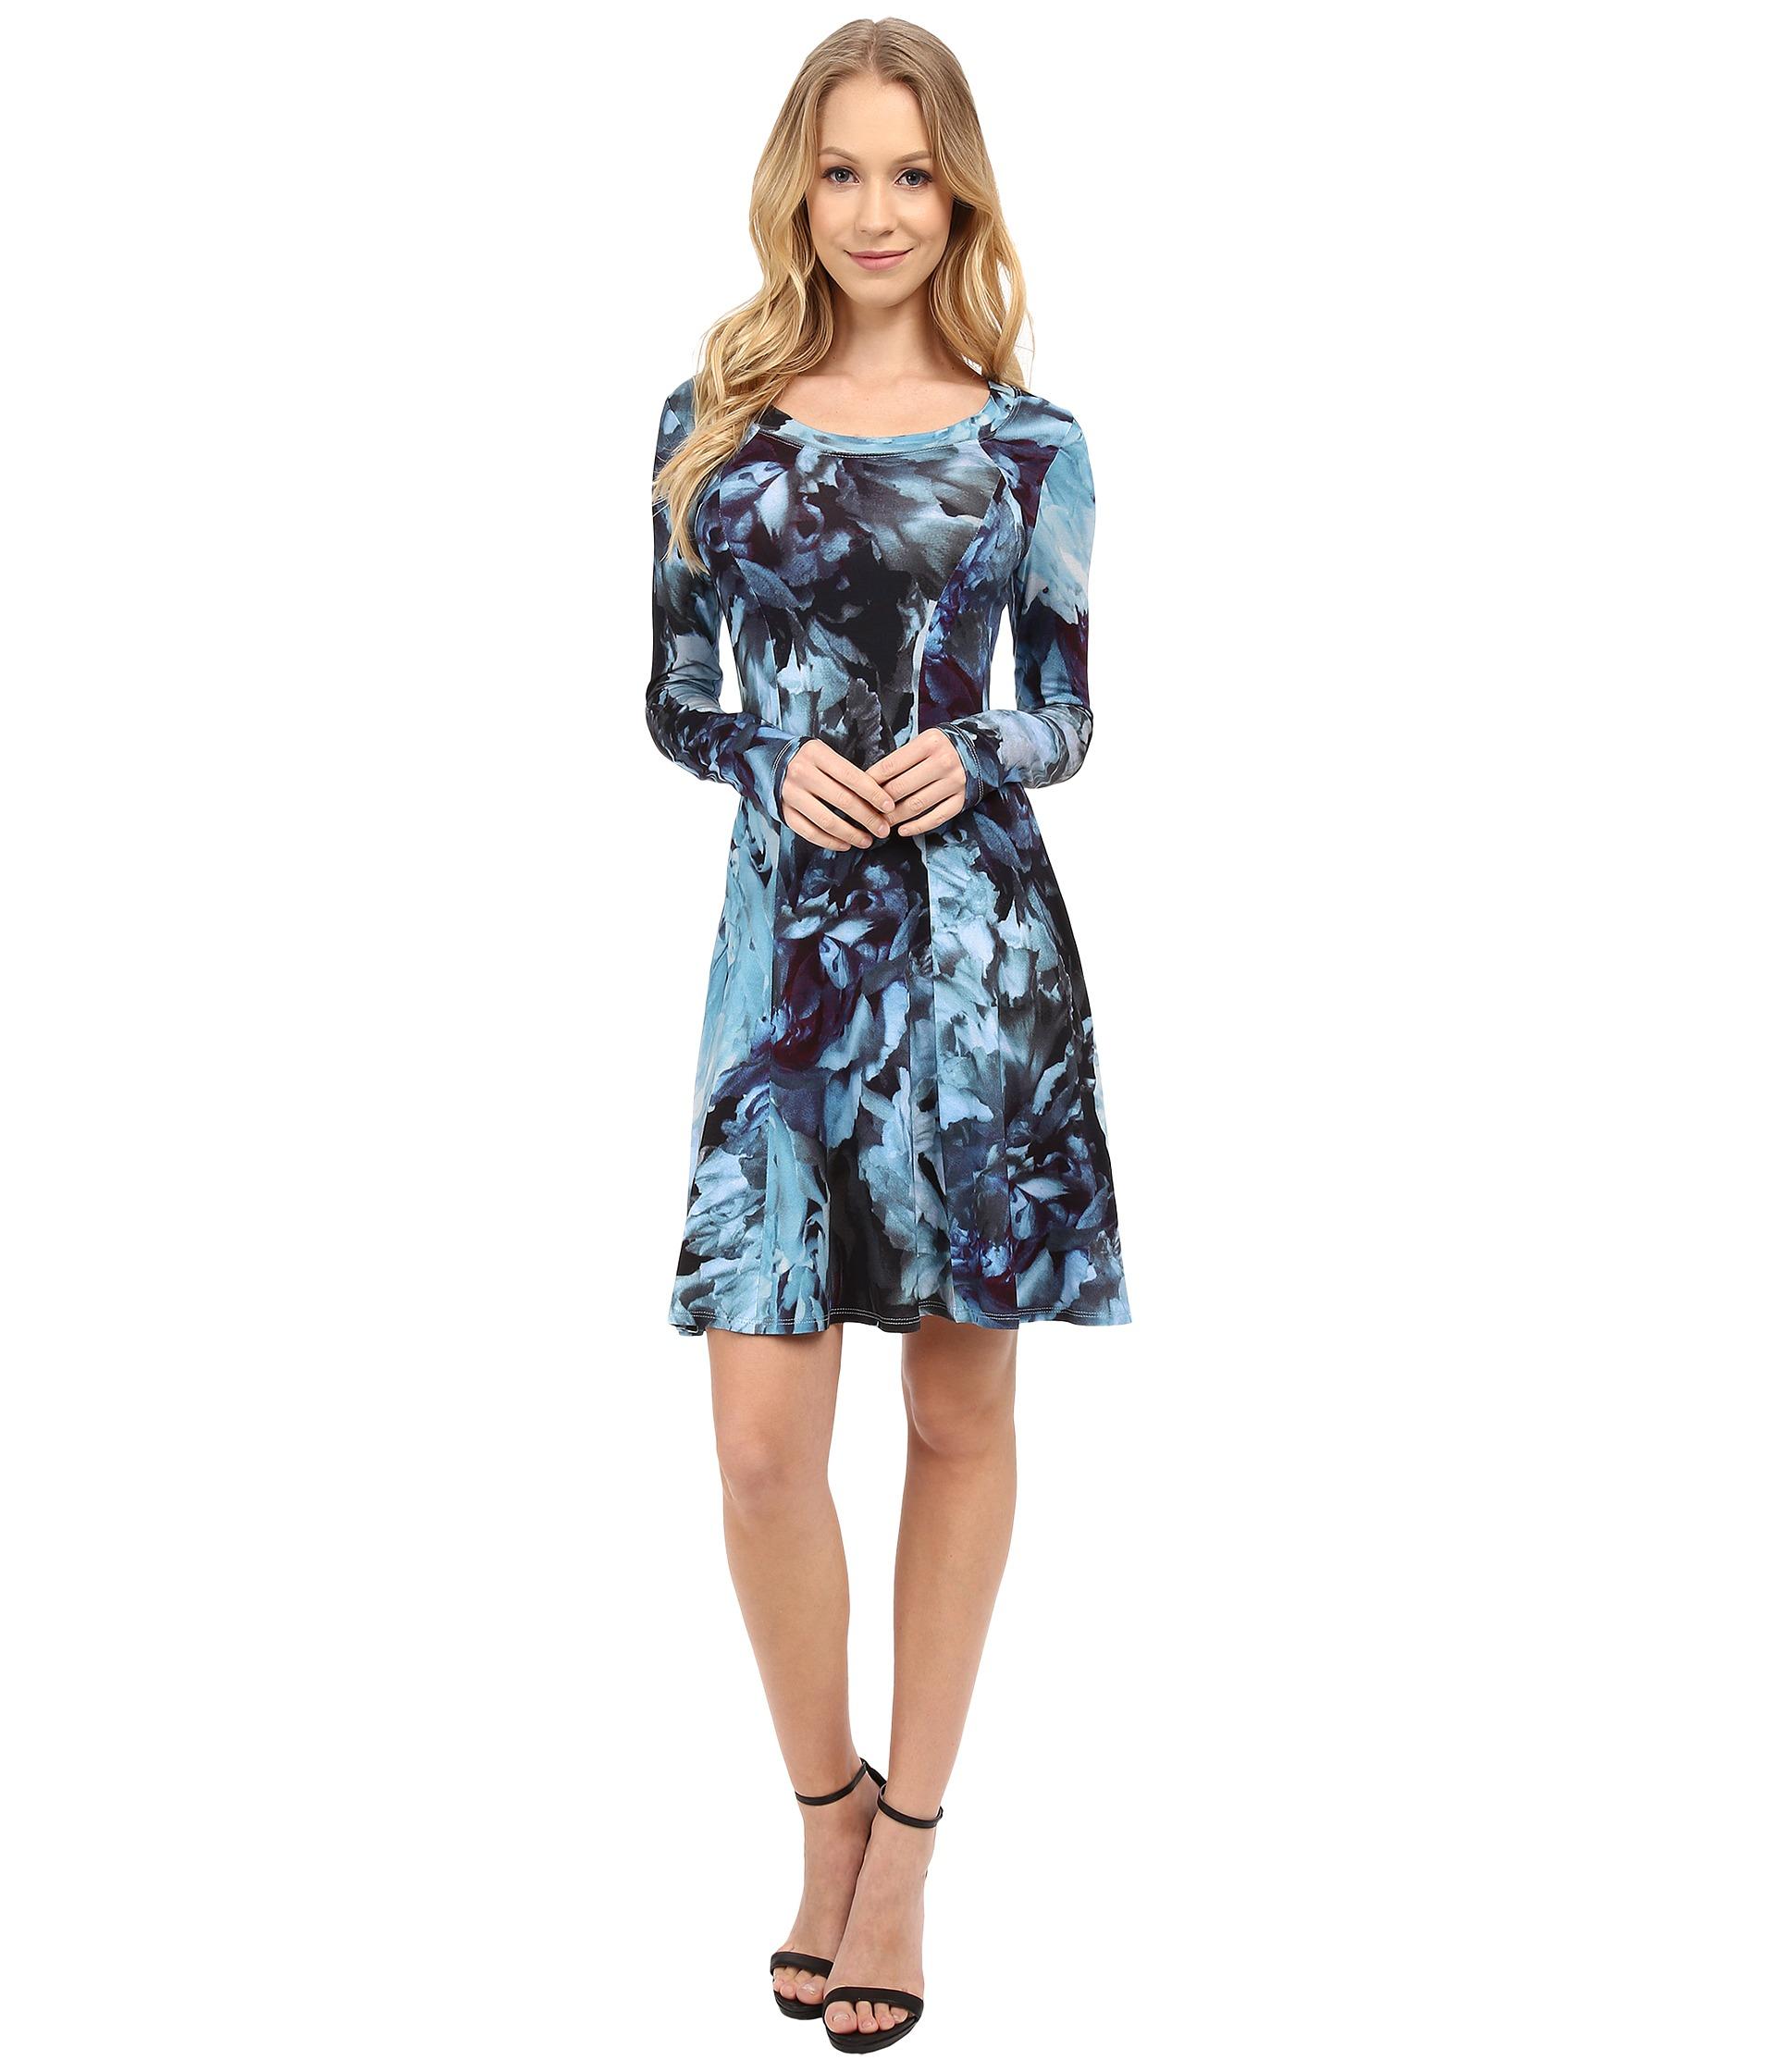 Karen Kane Sheer Diamond Tile Dress In Blue Print Save 20 Lyst